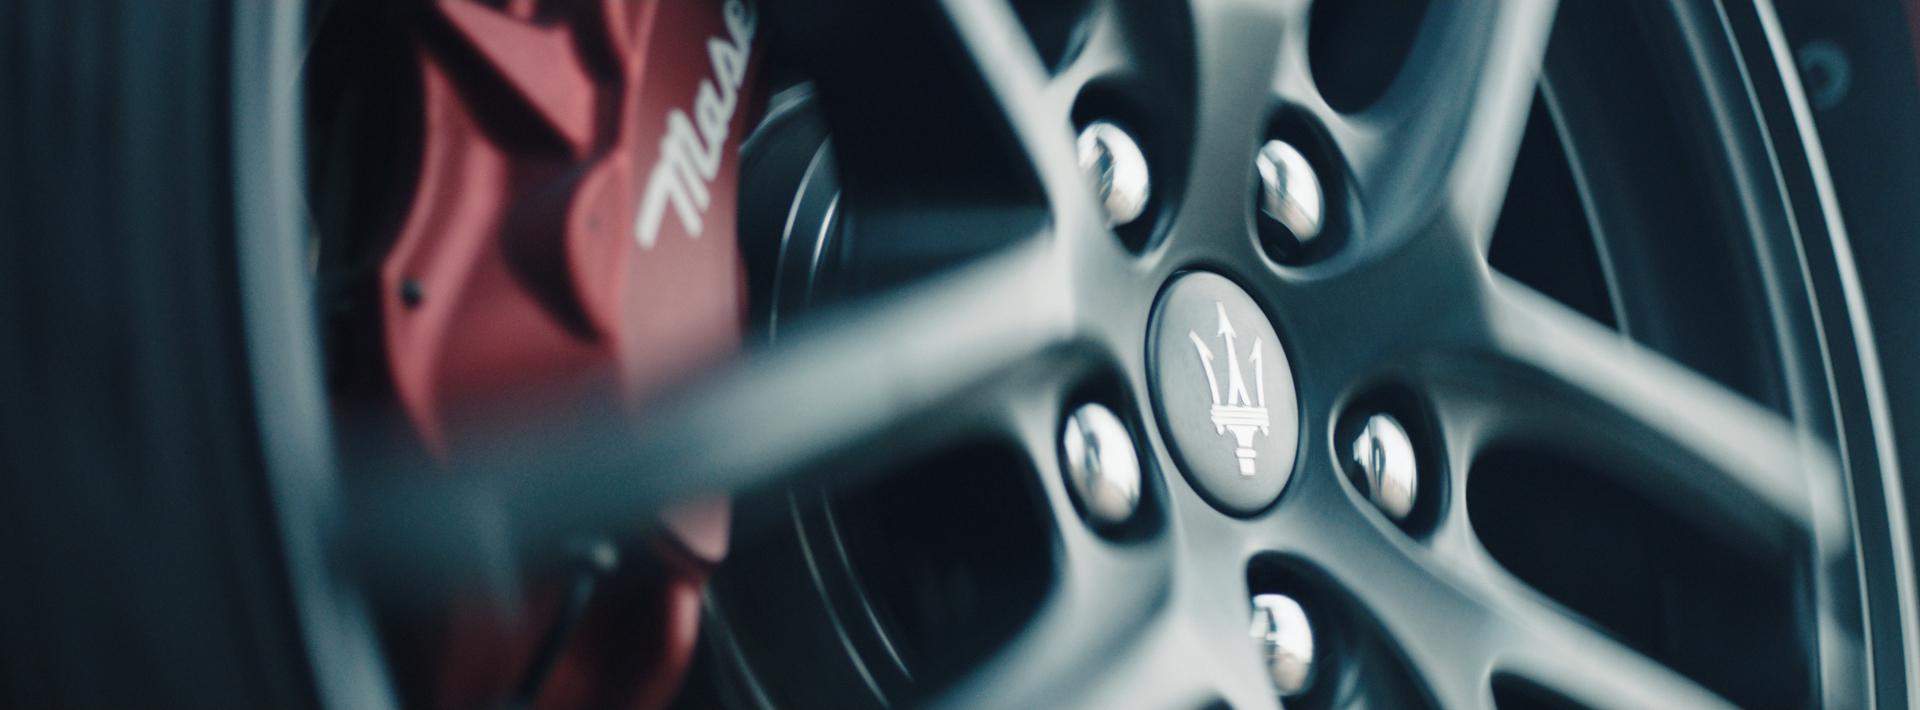 Maserati_1.92.1 copy.jpg